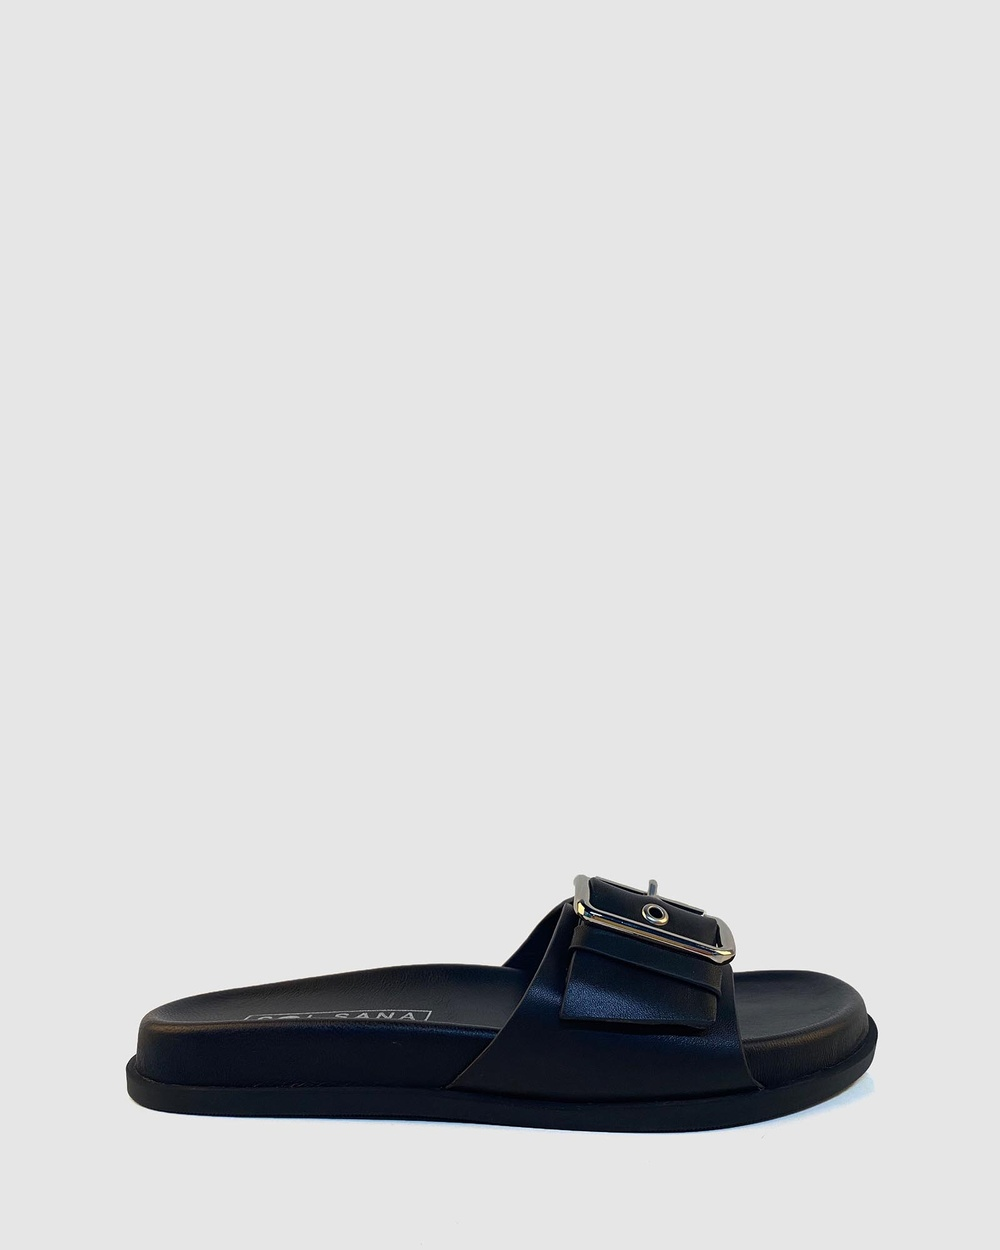 Sol Sana Kyle Slides Wedge Boots Black Australia